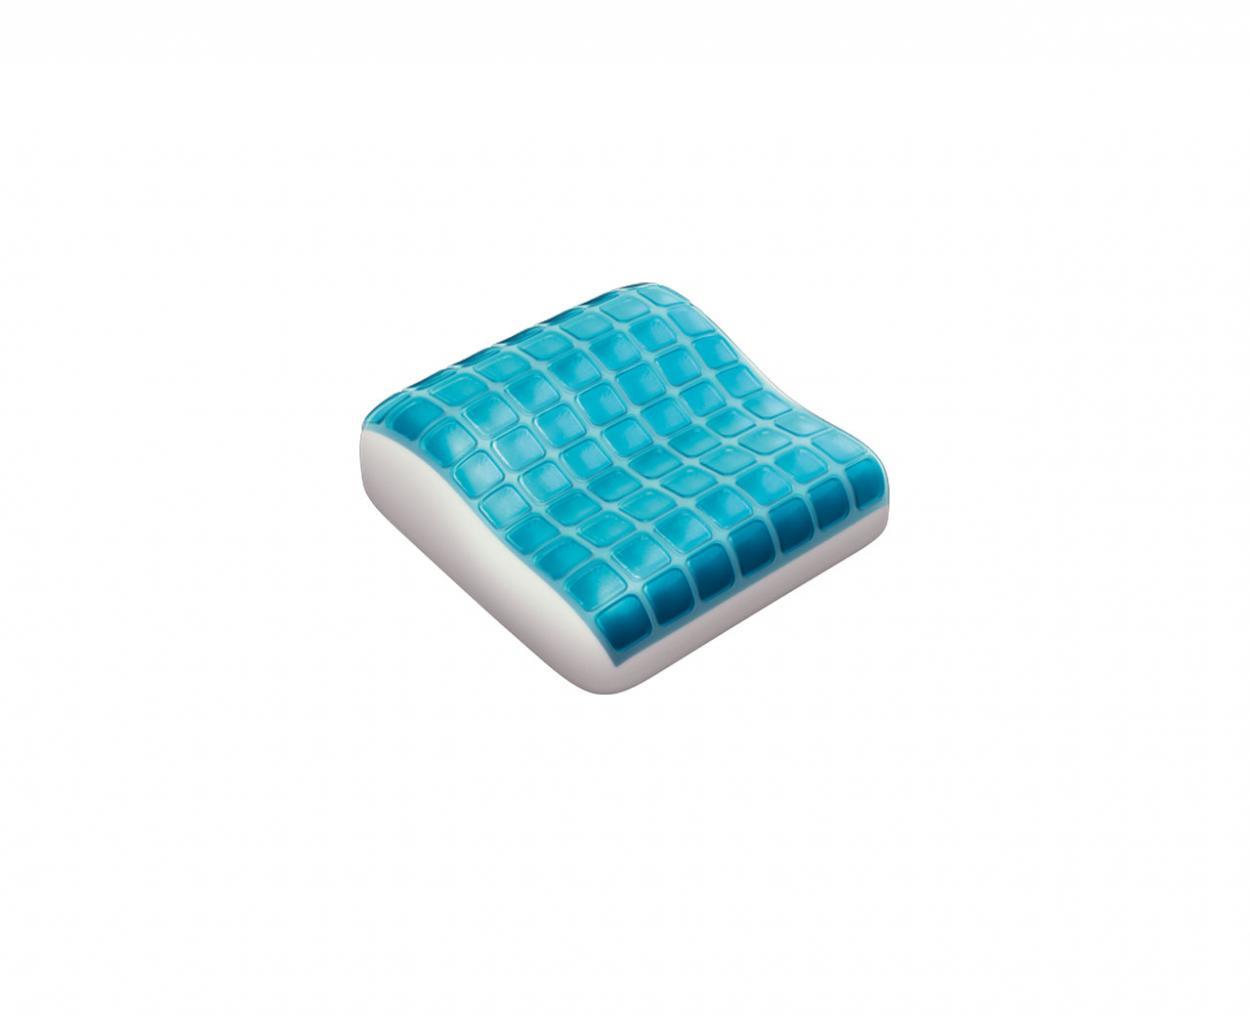 CandiaStrom - Μαξιλάρι Travel Pillow - Συλλογή TECHNOGEL COLLECTION - Γενική Εικόνα 2